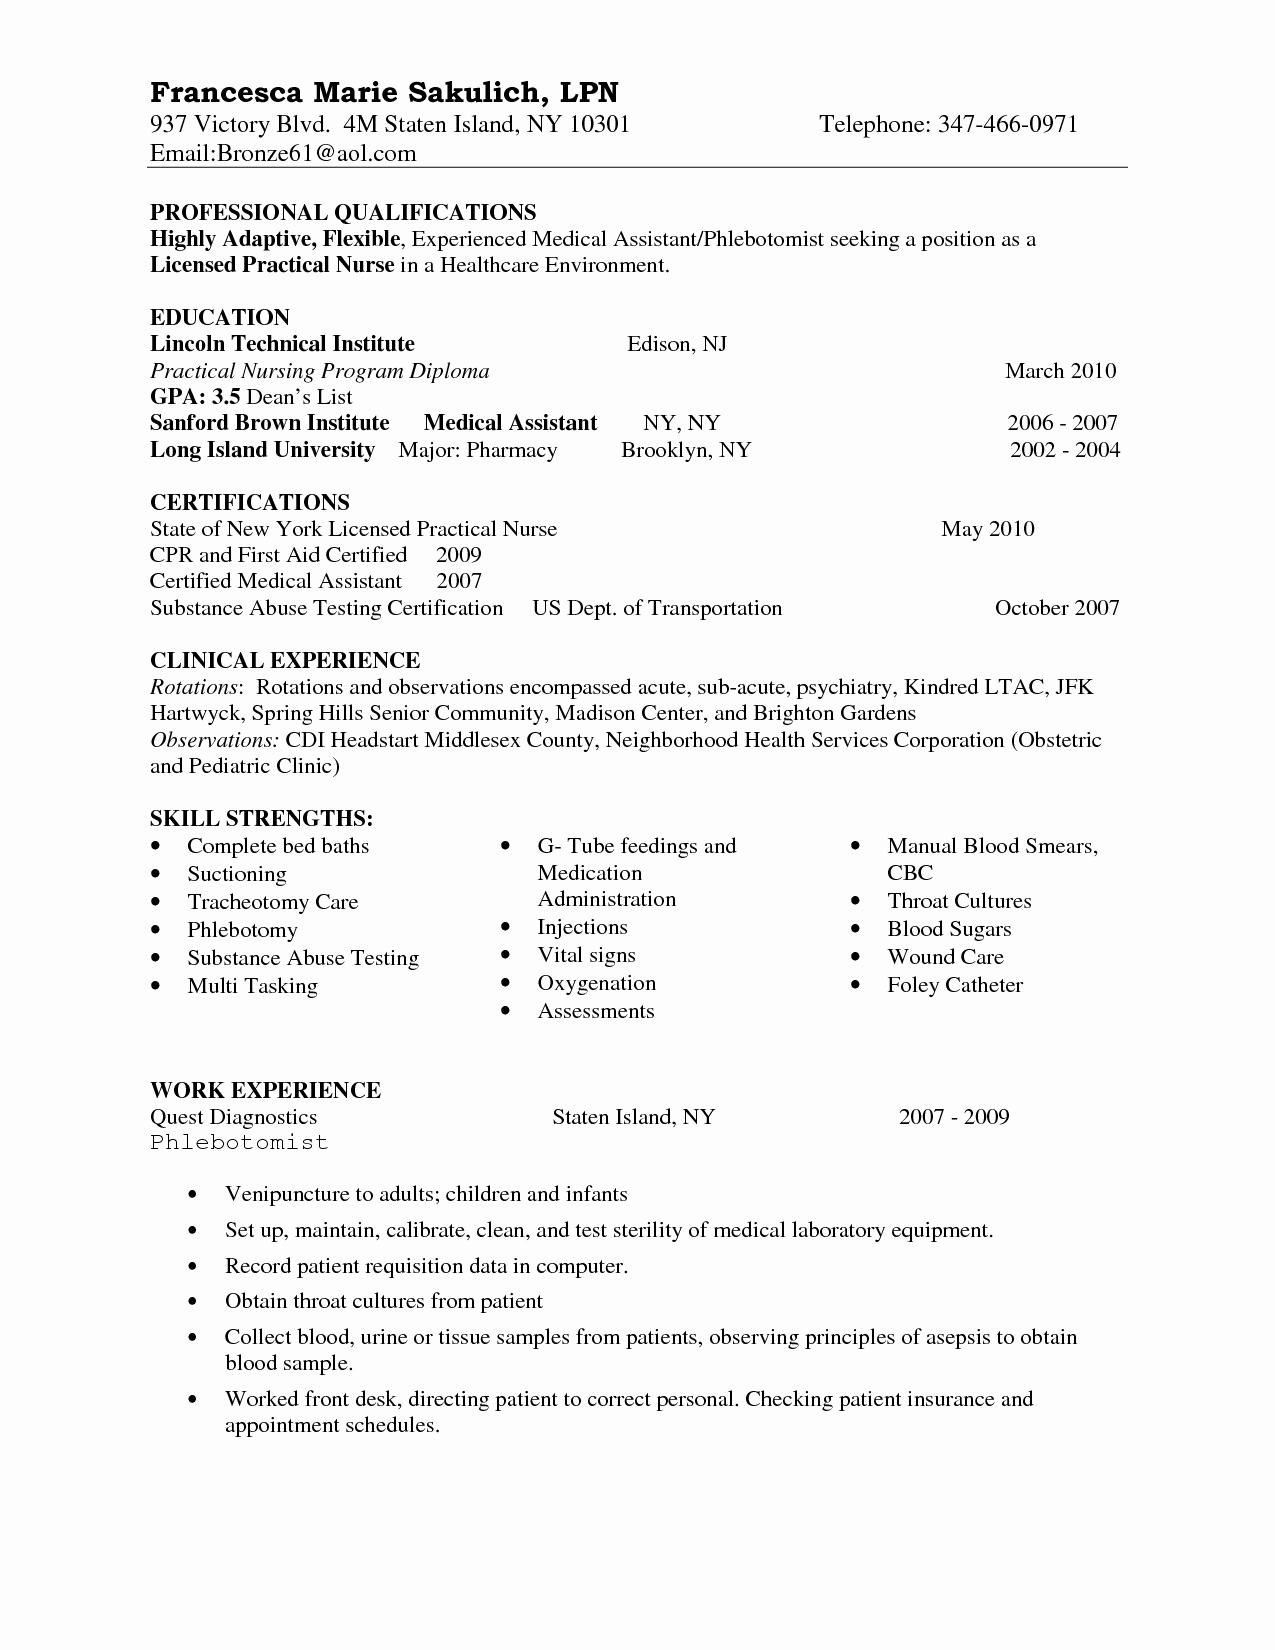 Nursing Clinical Experience Resume Lovely Entry Level Lpn Resume Sample Nursing